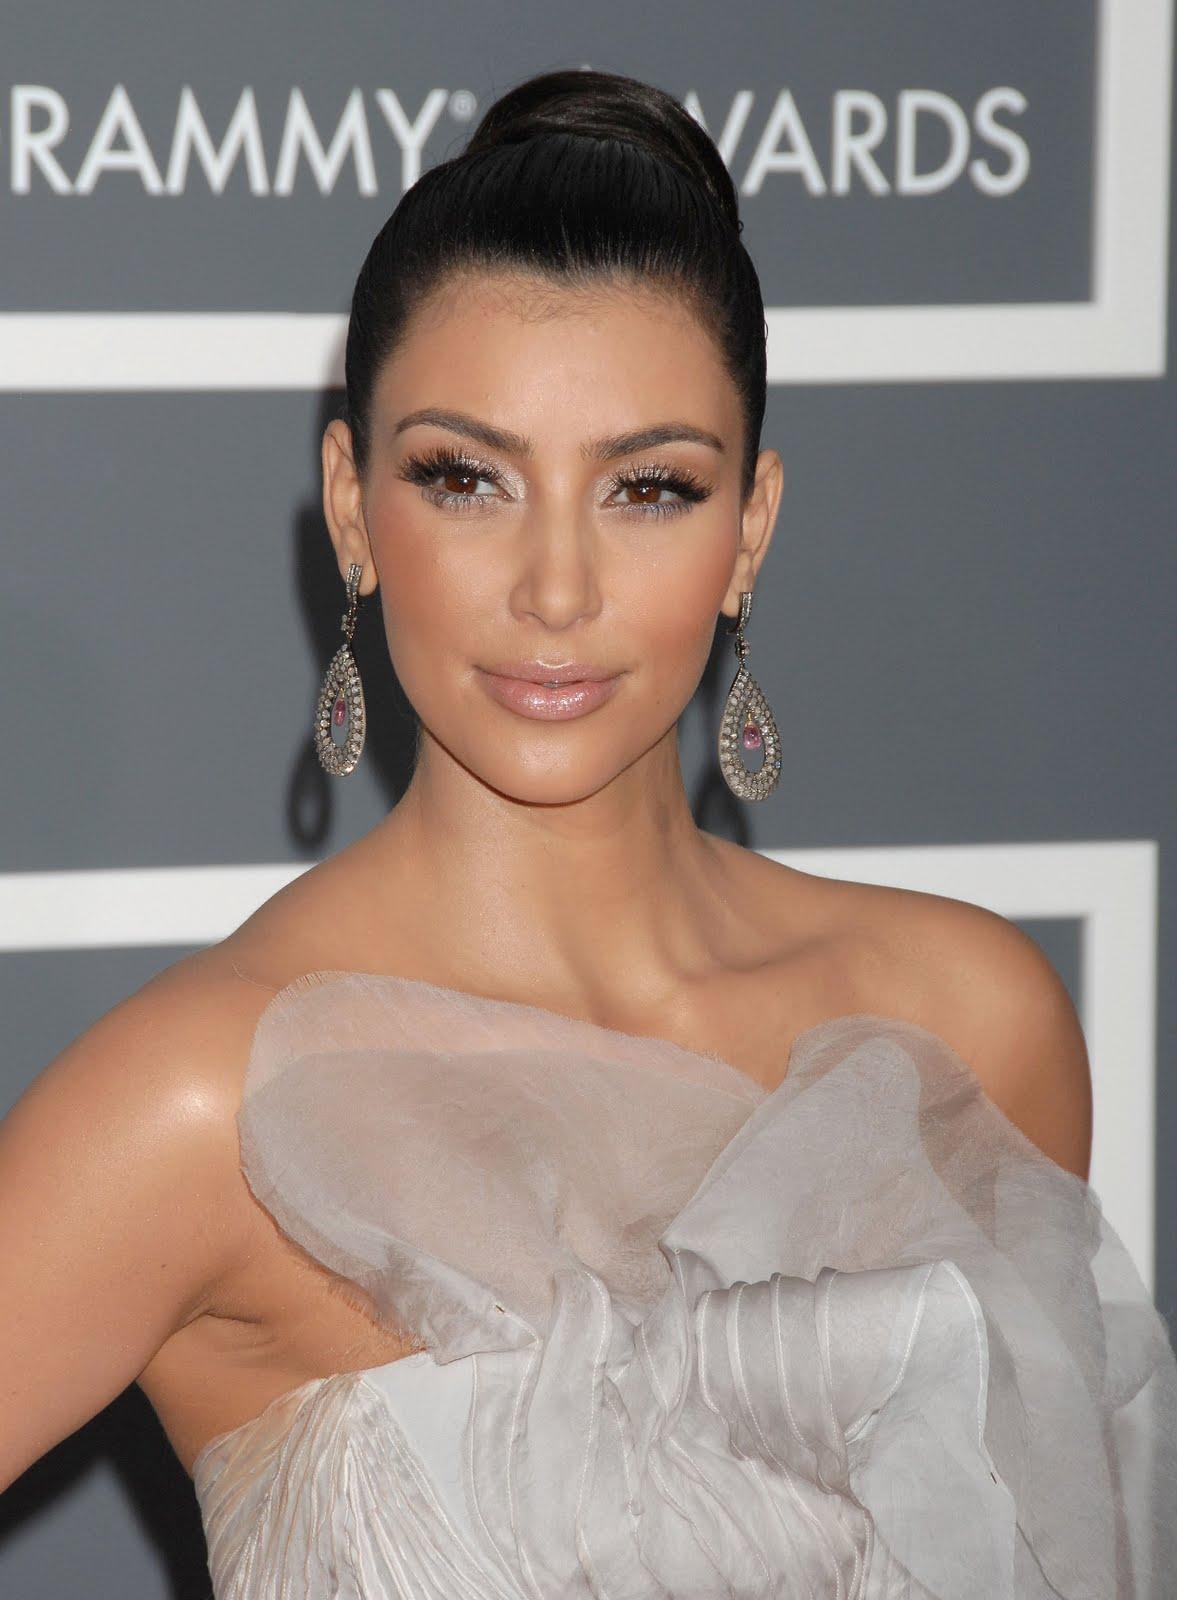 http://3.bp.blogspot.com/_PEPWIqGX5Uo/S9rXhV3NpEI/AAAAAAAAUbU/negt6gZThrs/s1600/Kim+Kardashian.jpg